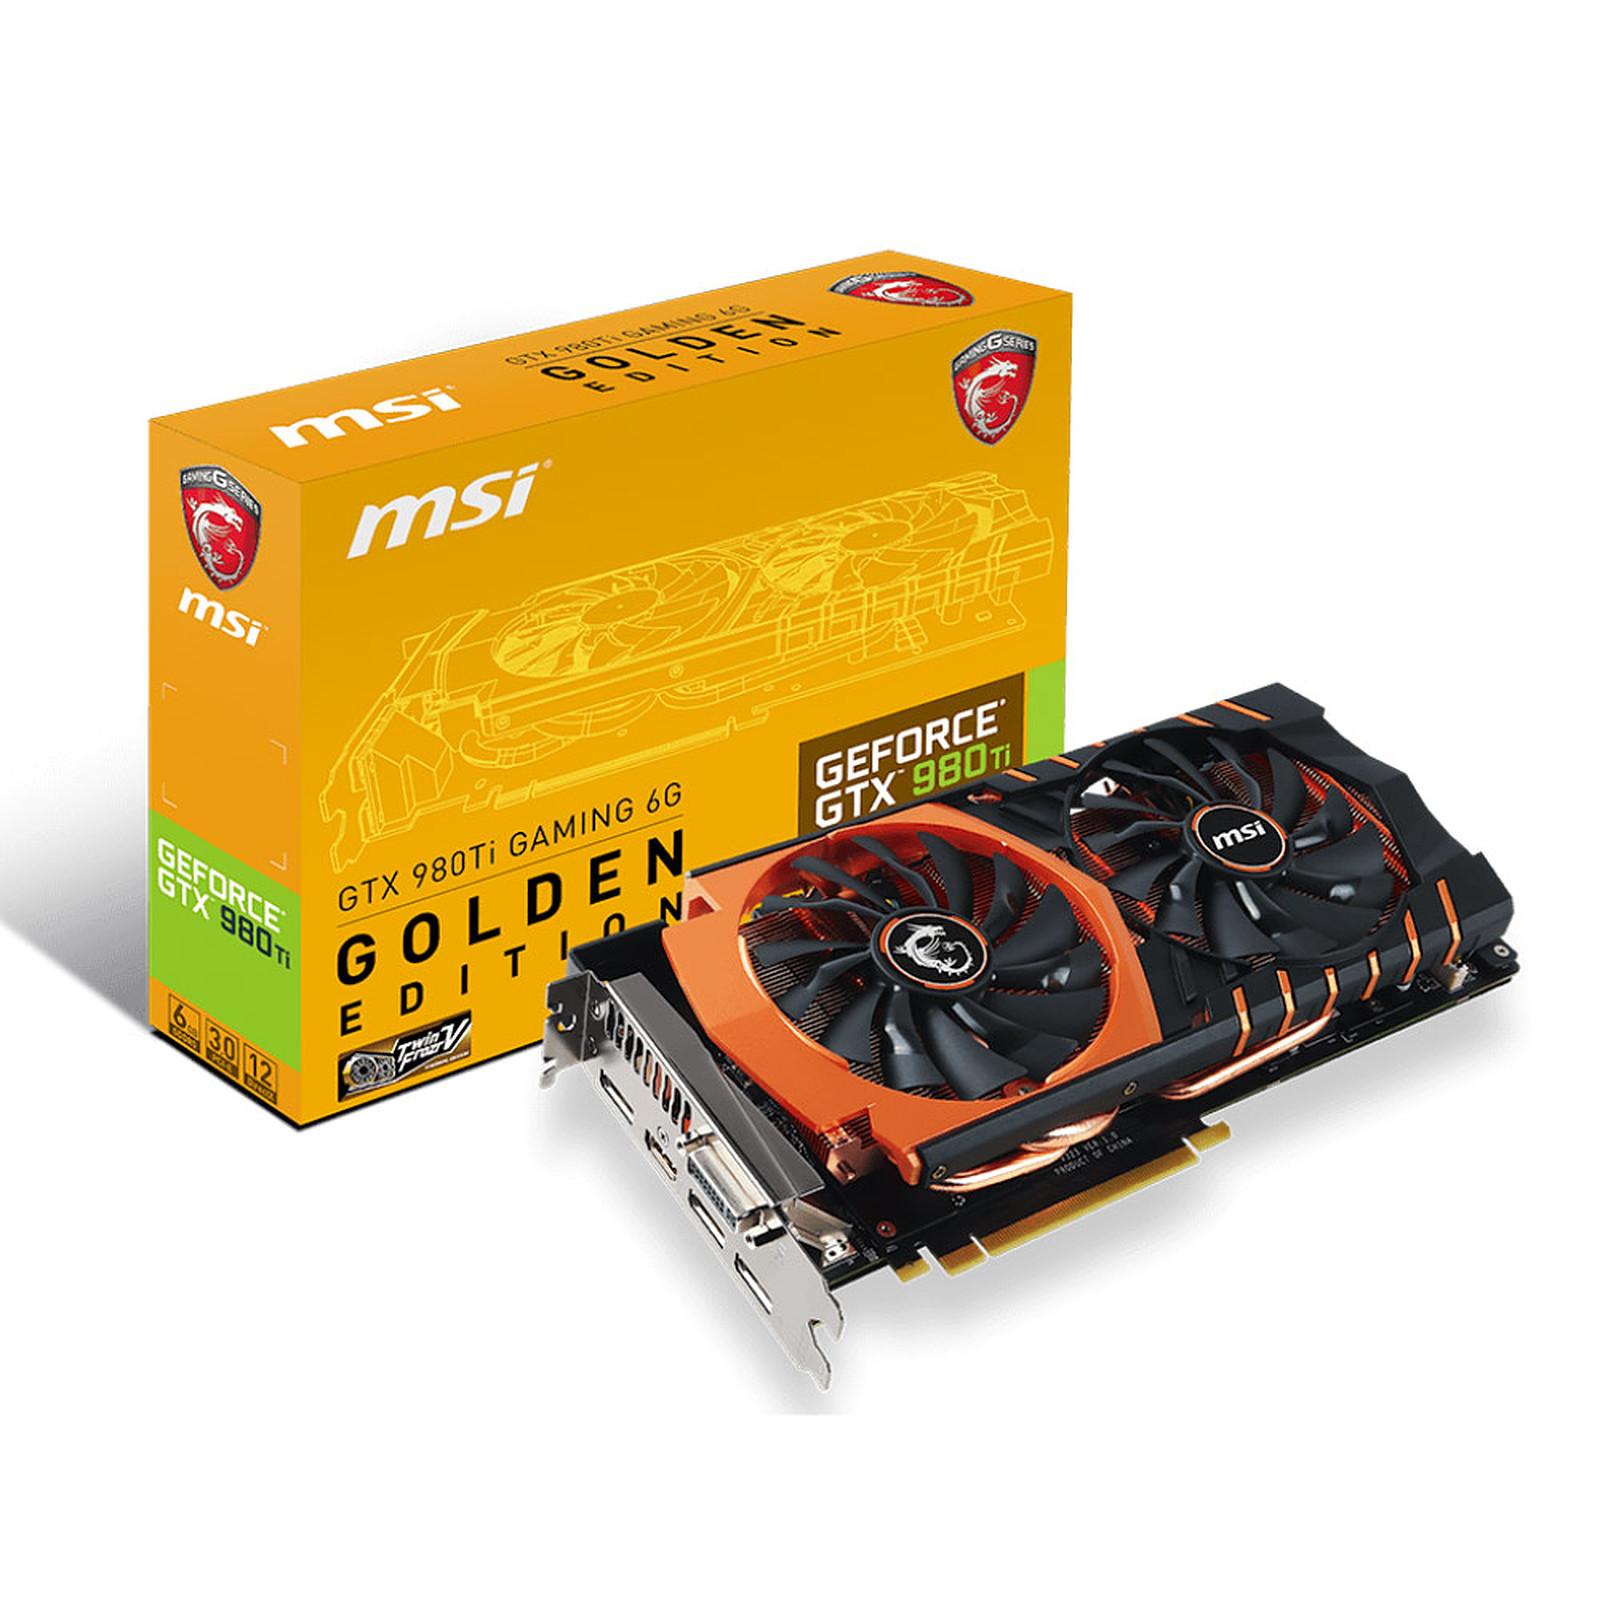 MSI GeForce GTX 980 TI GAMING 6 G GOLDEN EDITION